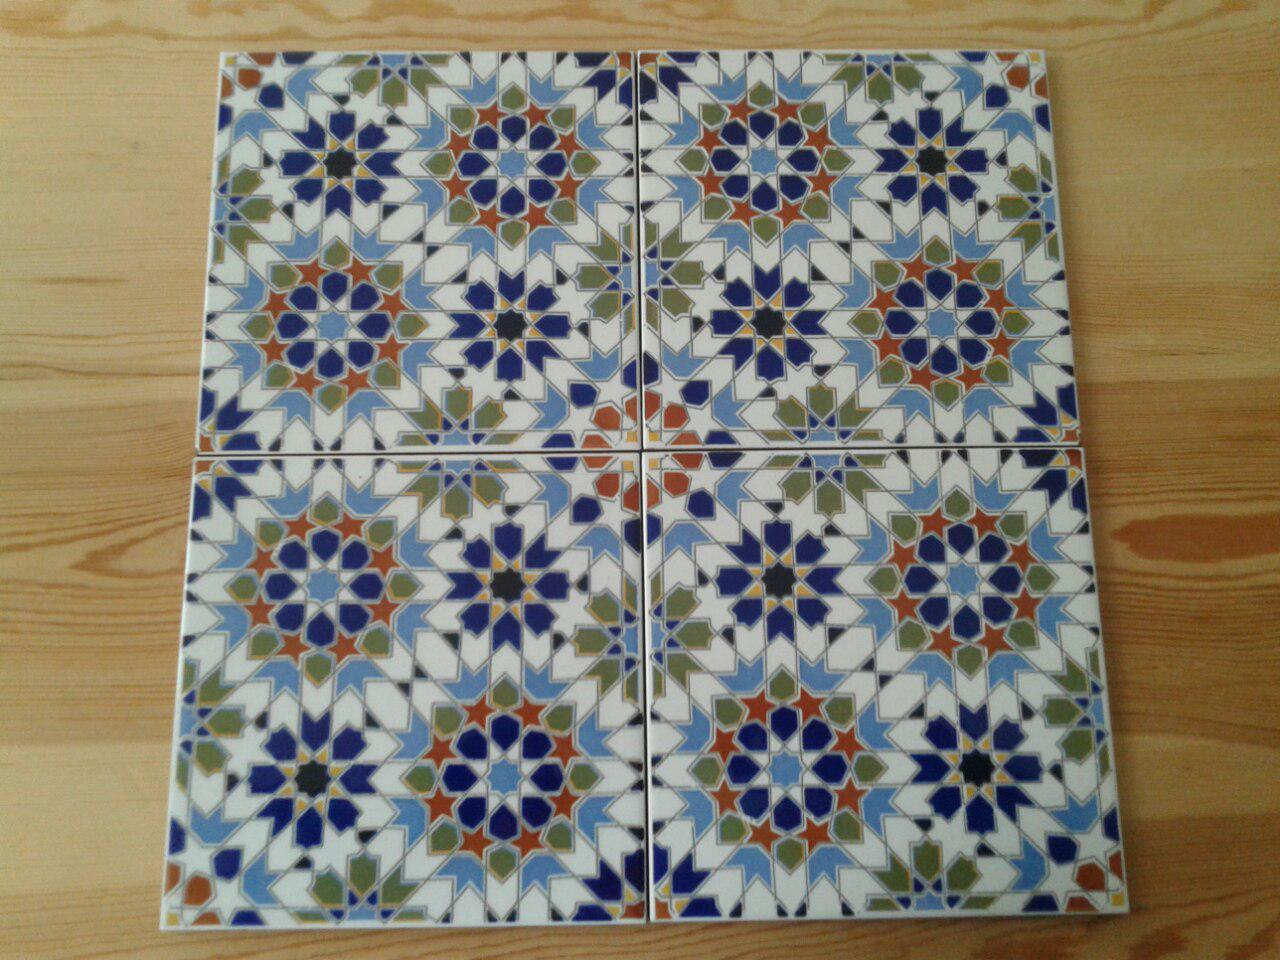 Marokkaanse Tegels Kopen : Marokkaanse tegels kopen